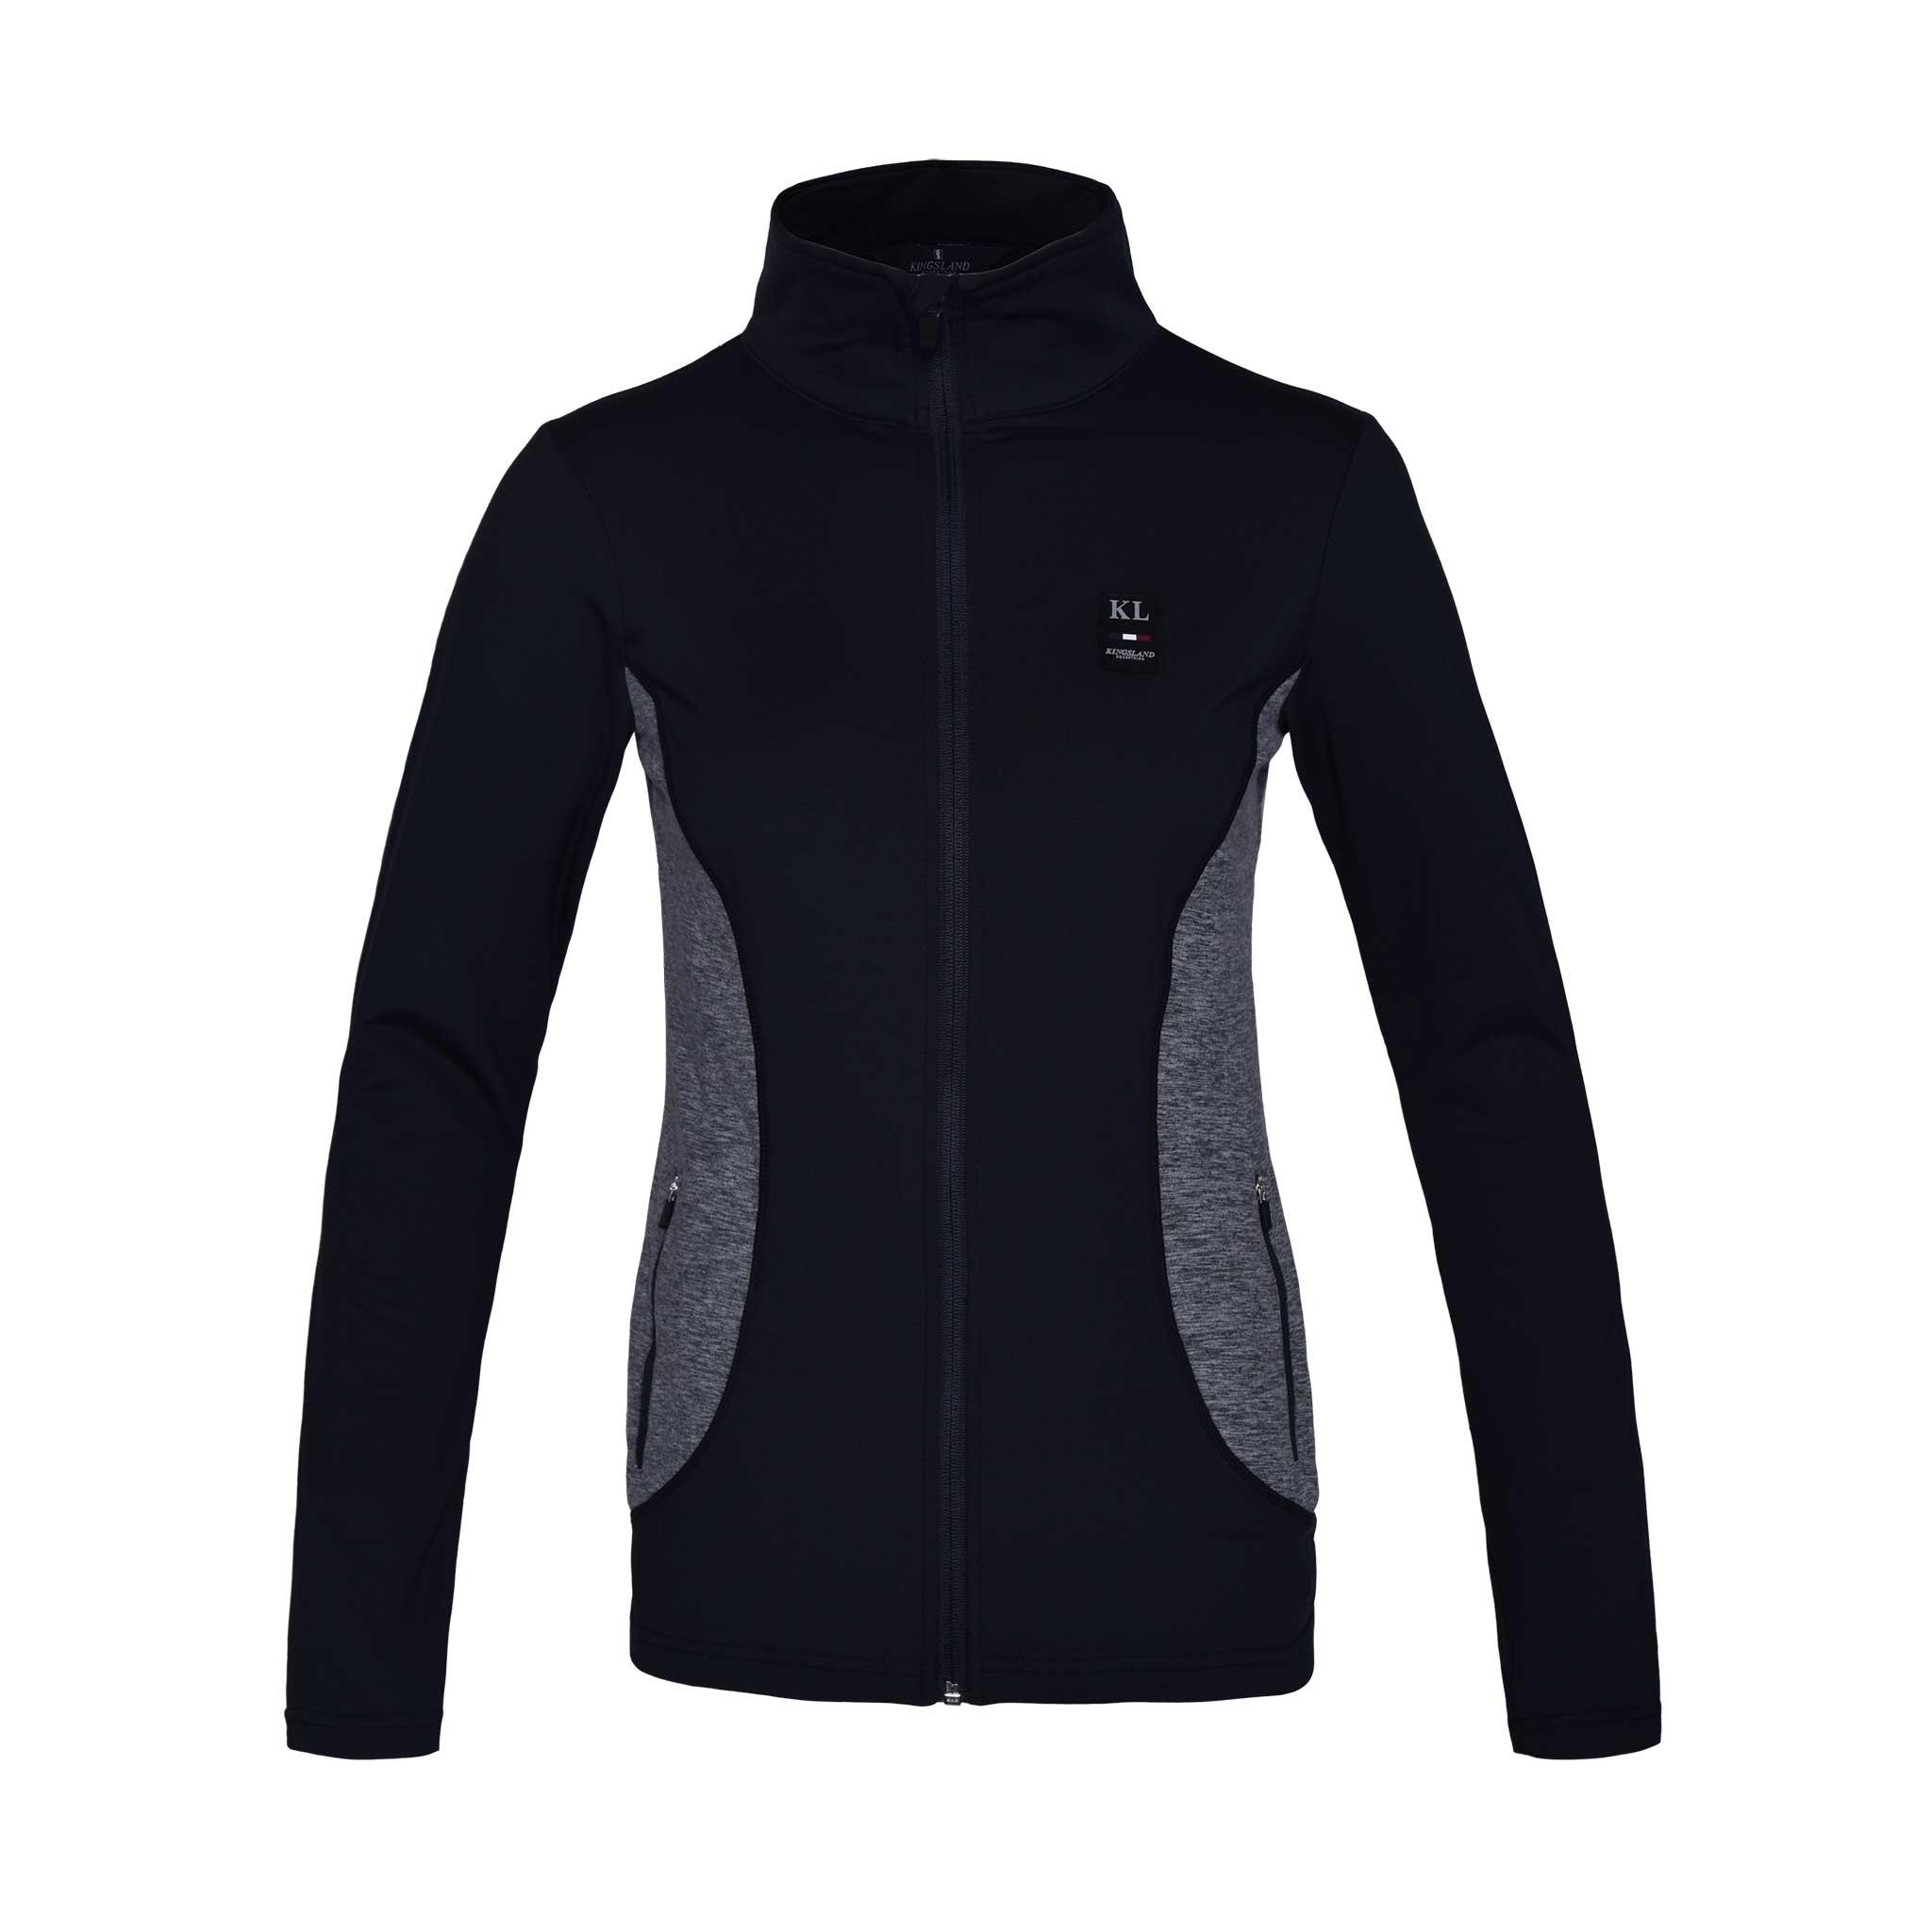 KINGSLAND KINGSLAND tamara junior fleece jacket